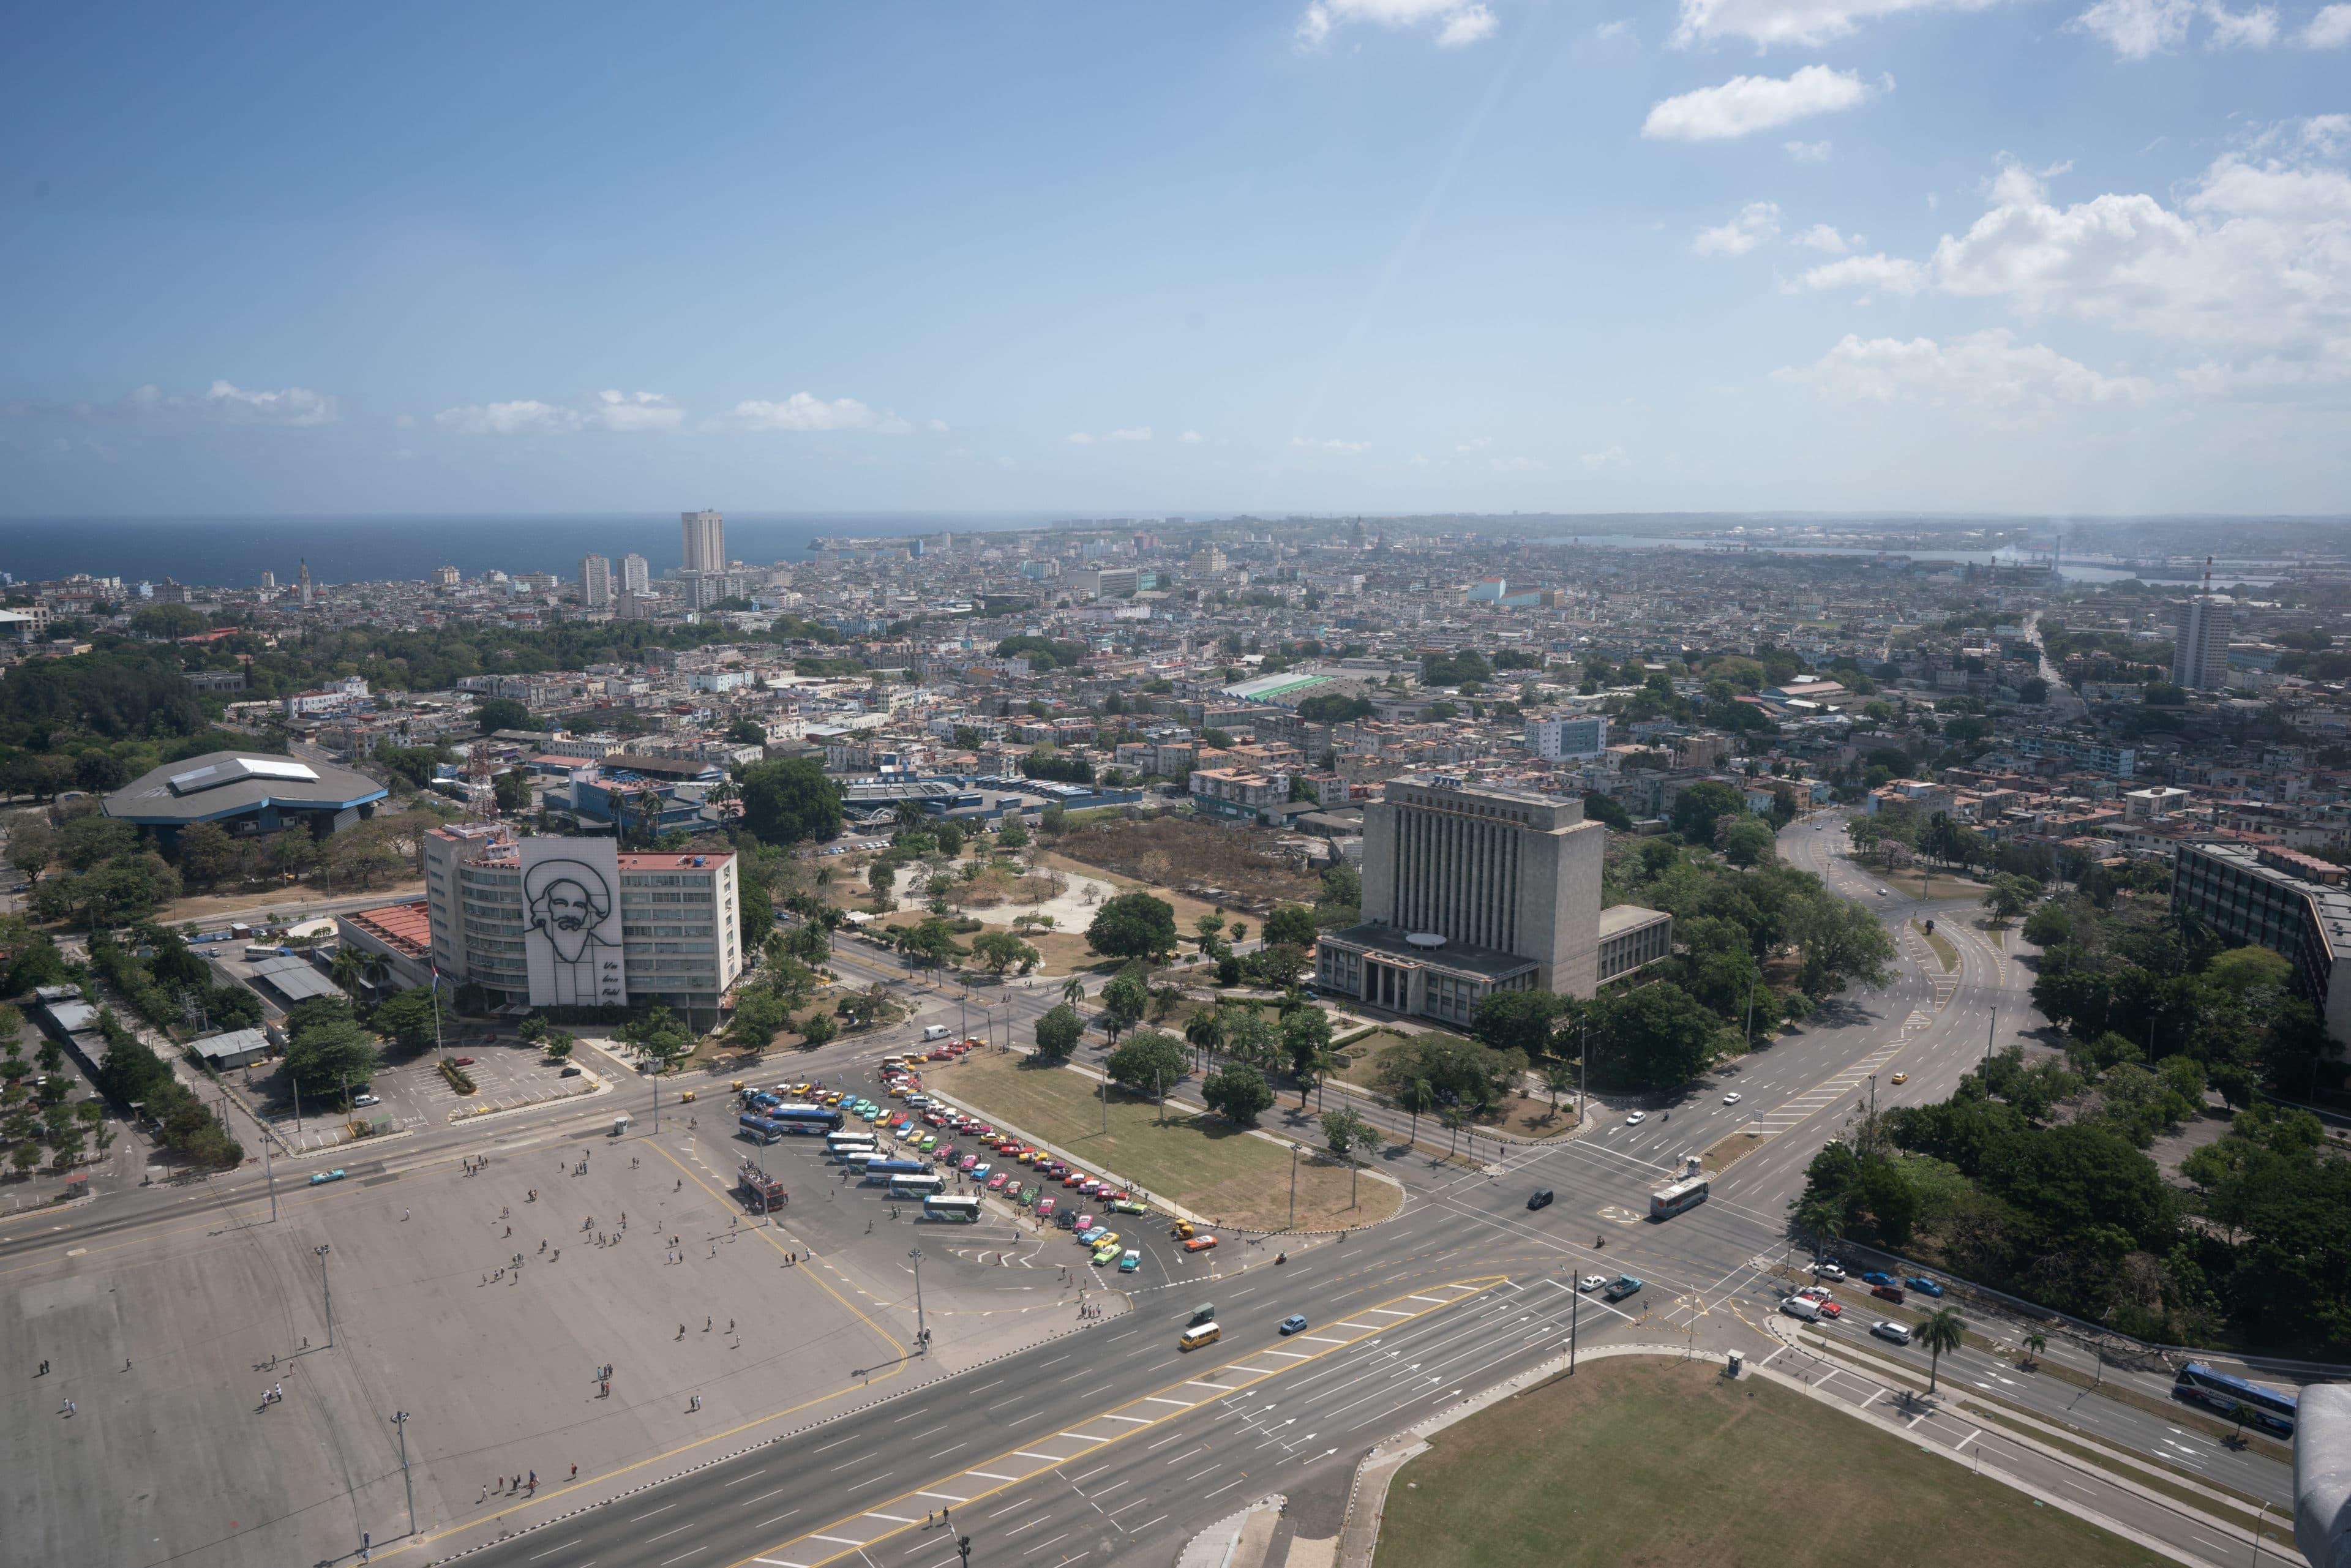 Blick auf den Plaza de La Revolucion, Havanna